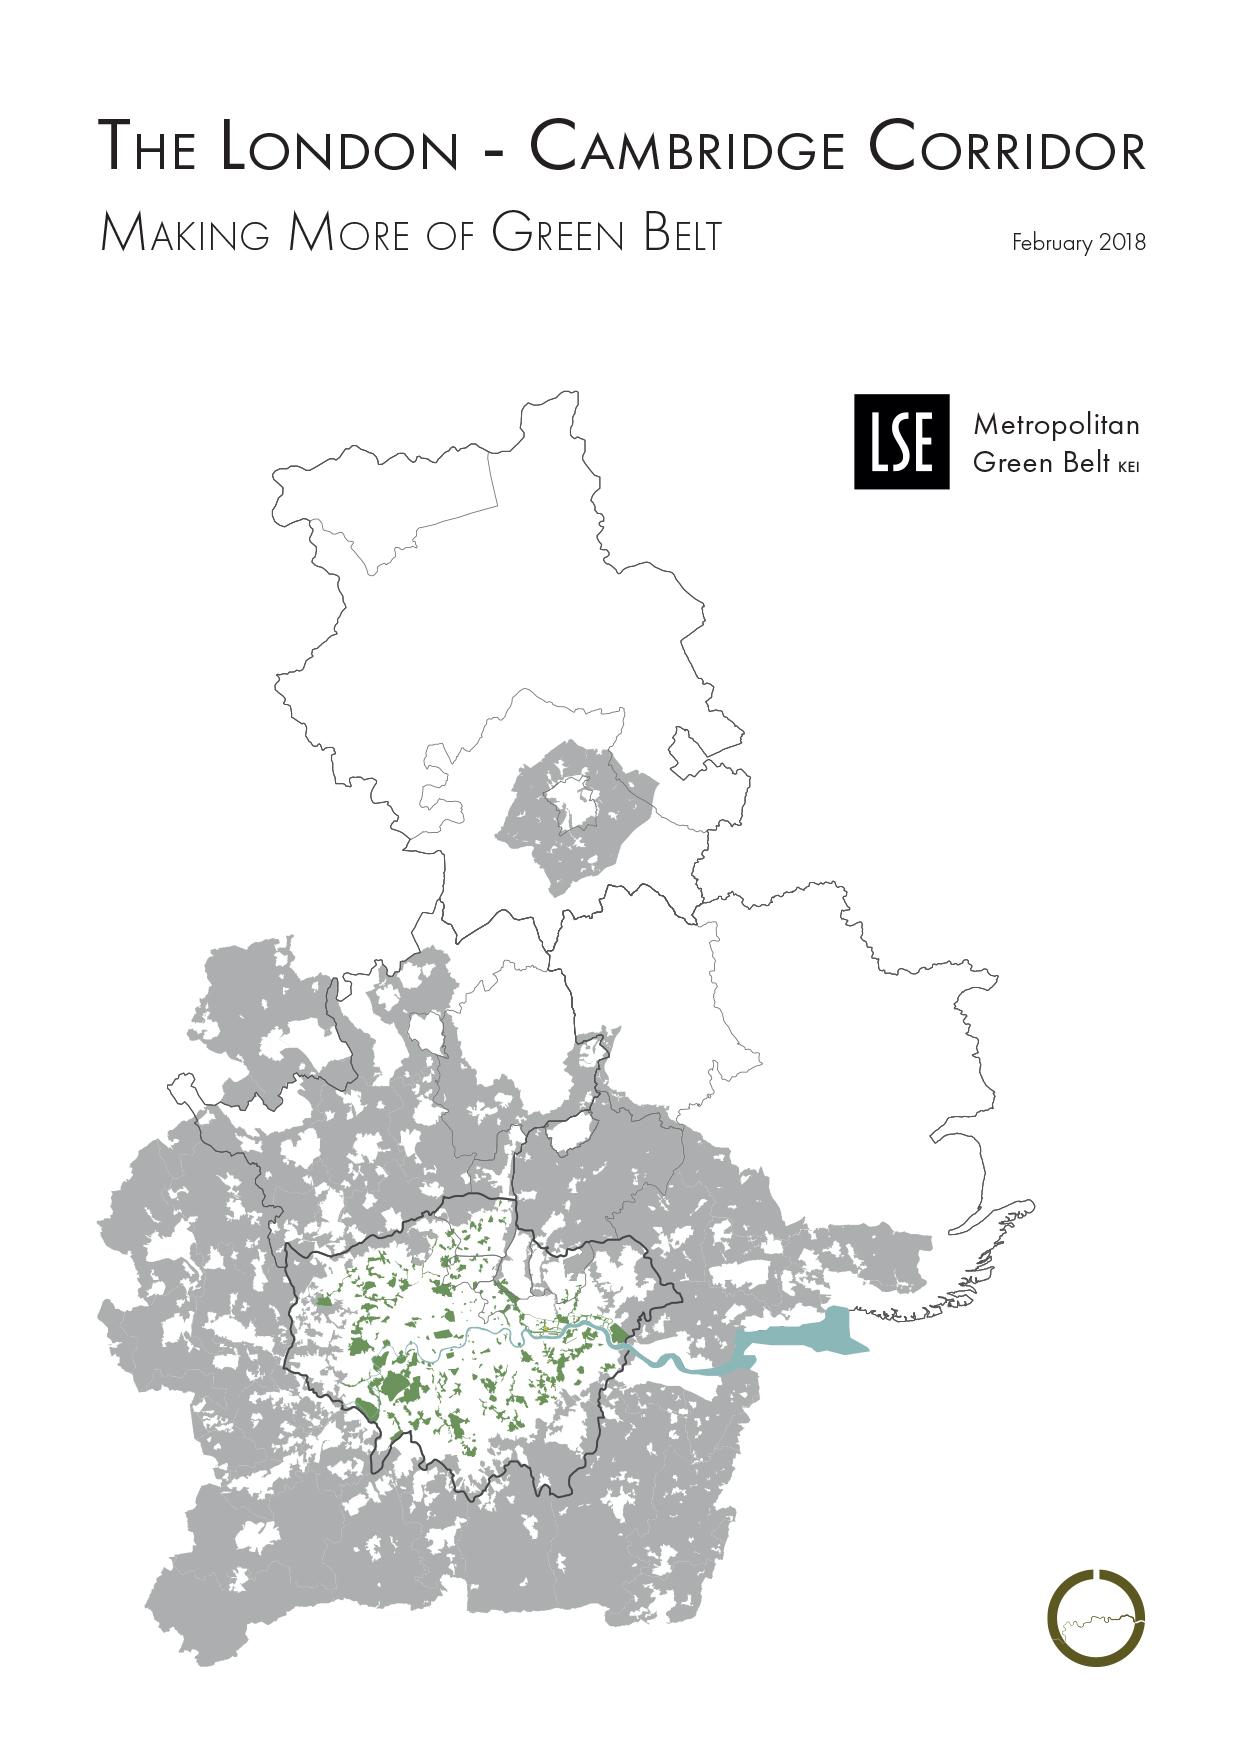 The London - Cambridge Corridor: Making more of the Green Belt